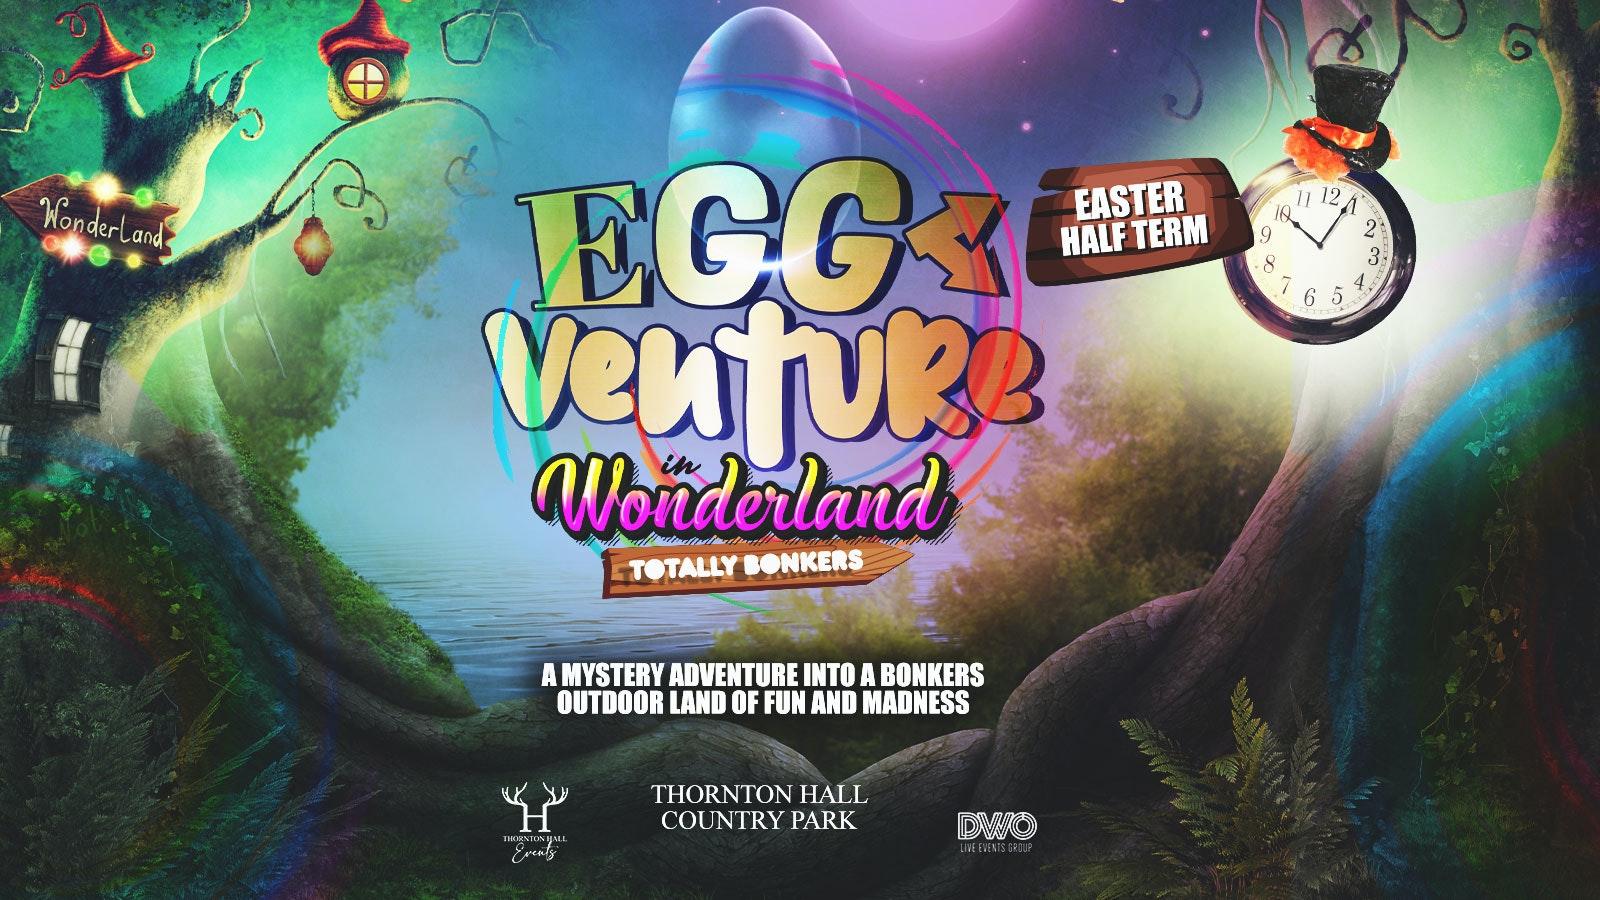 EggVenture in Wonderland – Thursday 8th April – 12noon